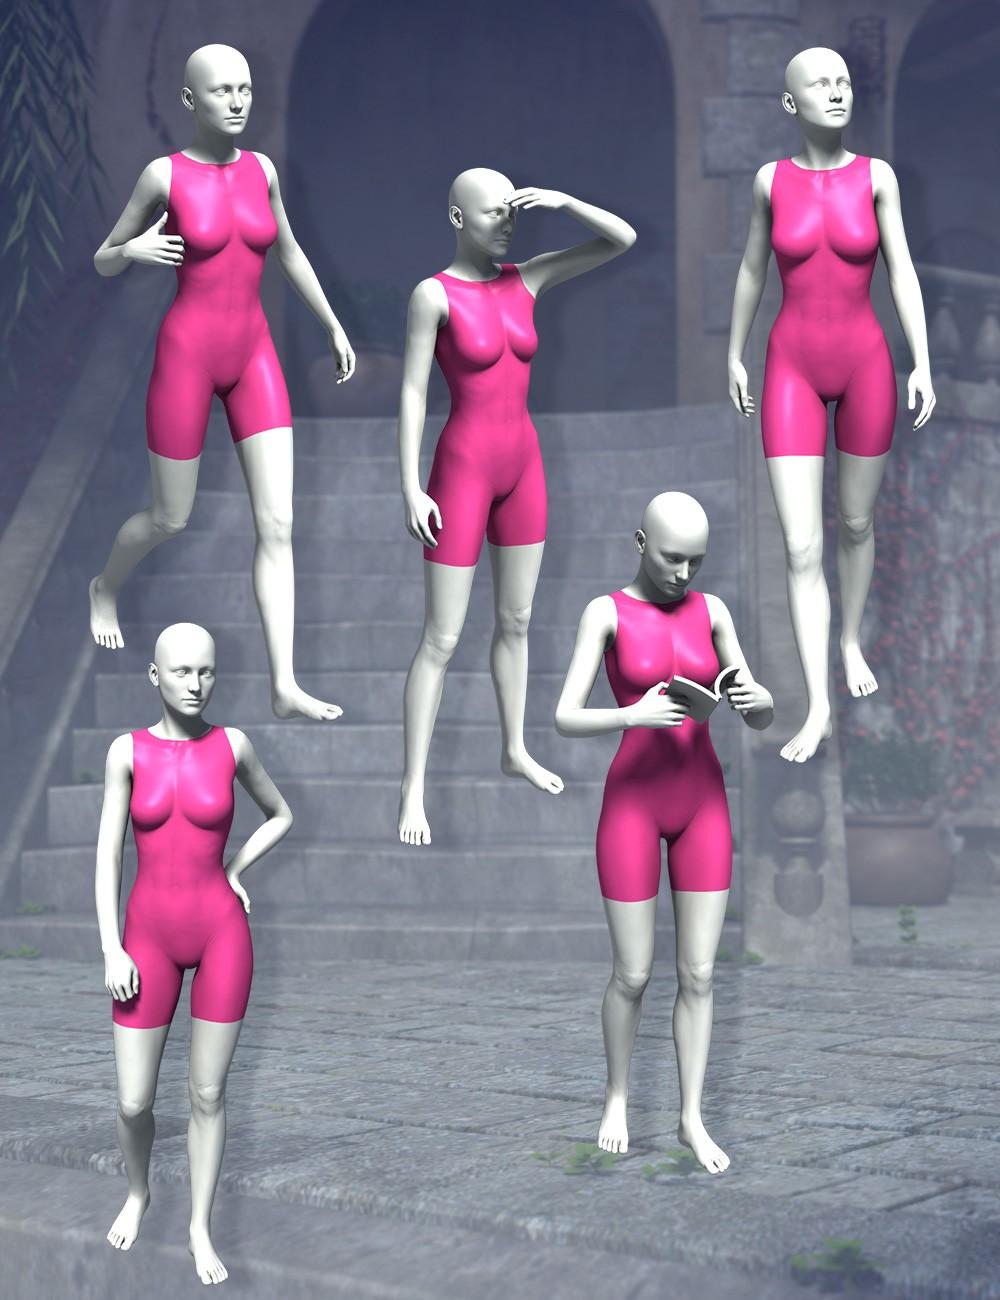 3d Models - The Tourist Bundle and Victoria 6 The Tourist Poses